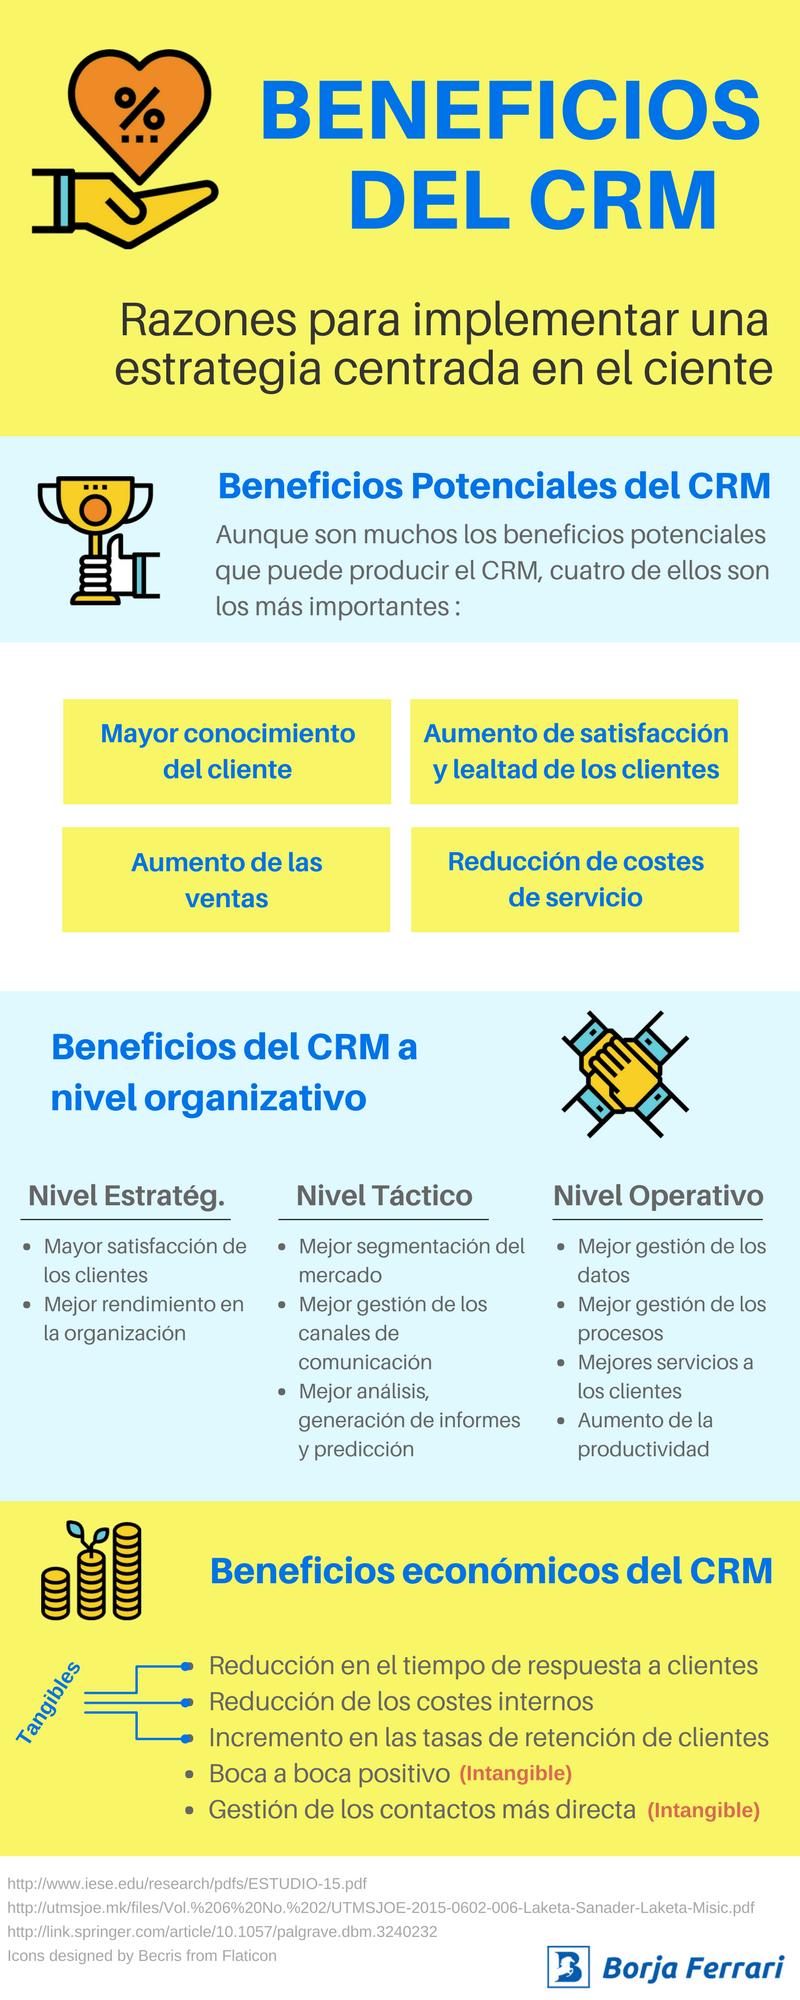 Infografia - Beneficios del CRM (Borja Ferrari)